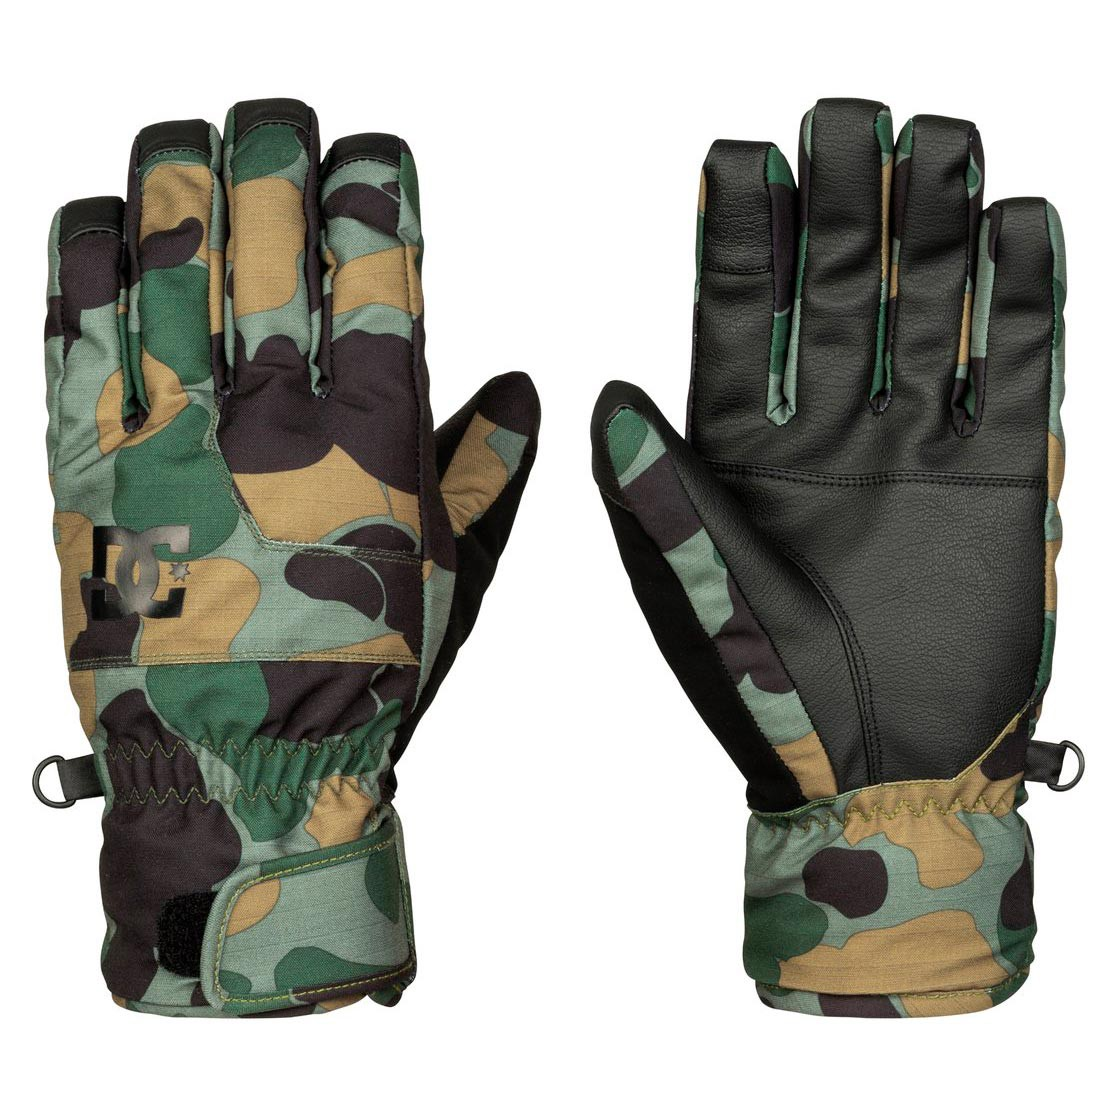 Rukavice DC Seger camouflage lodge men